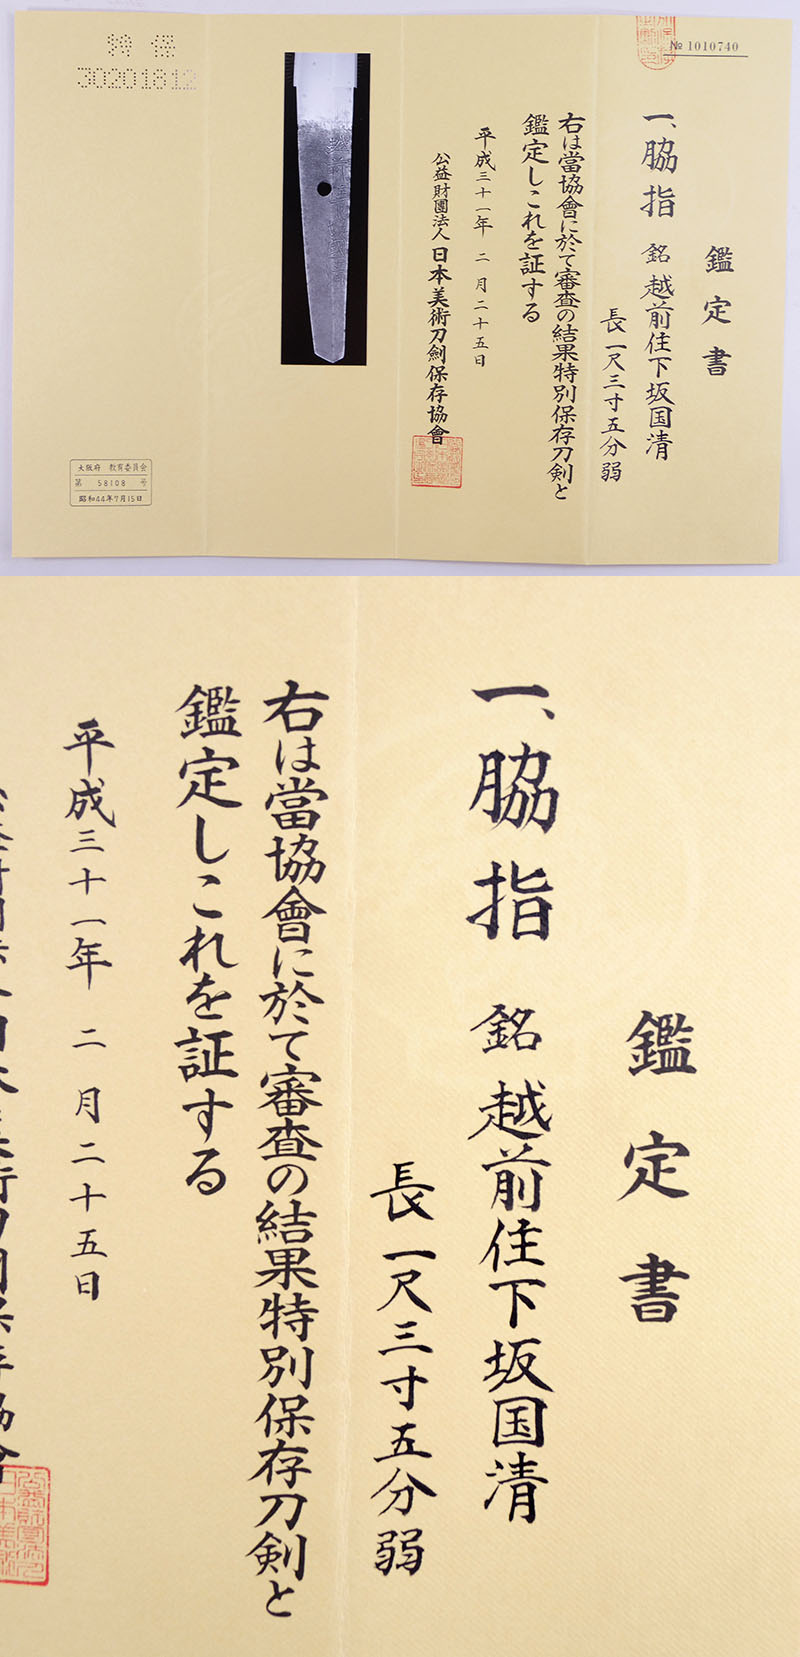 越前住下坂国清 Picture of Certificate